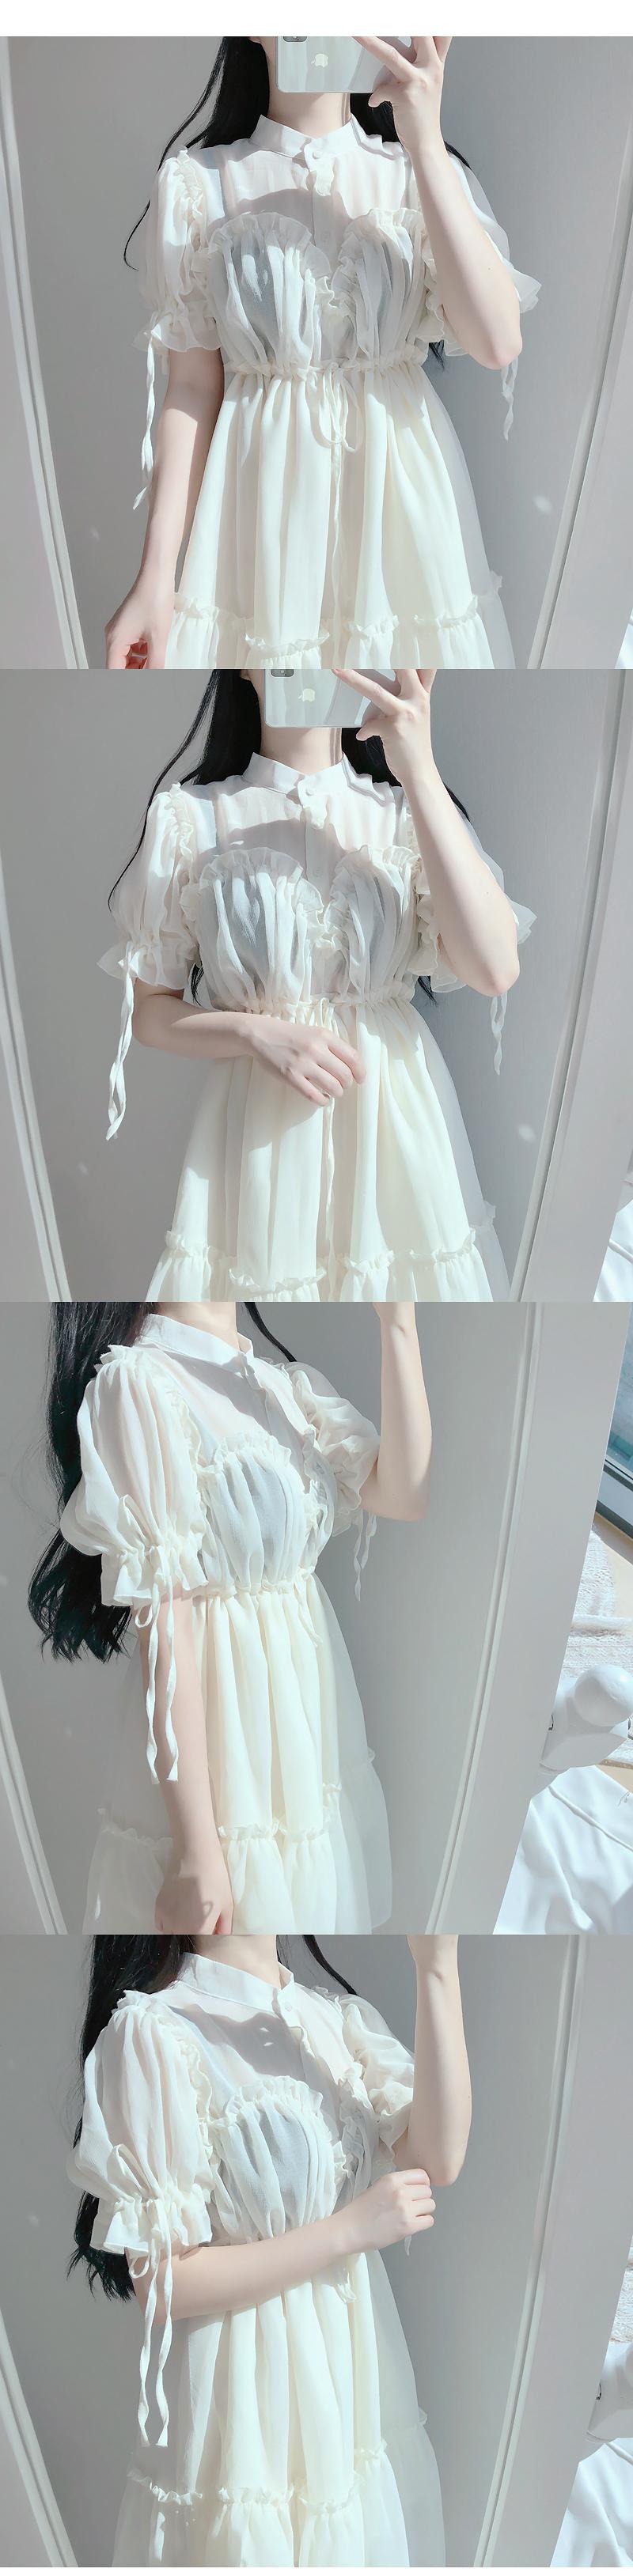 Angel frilly dress